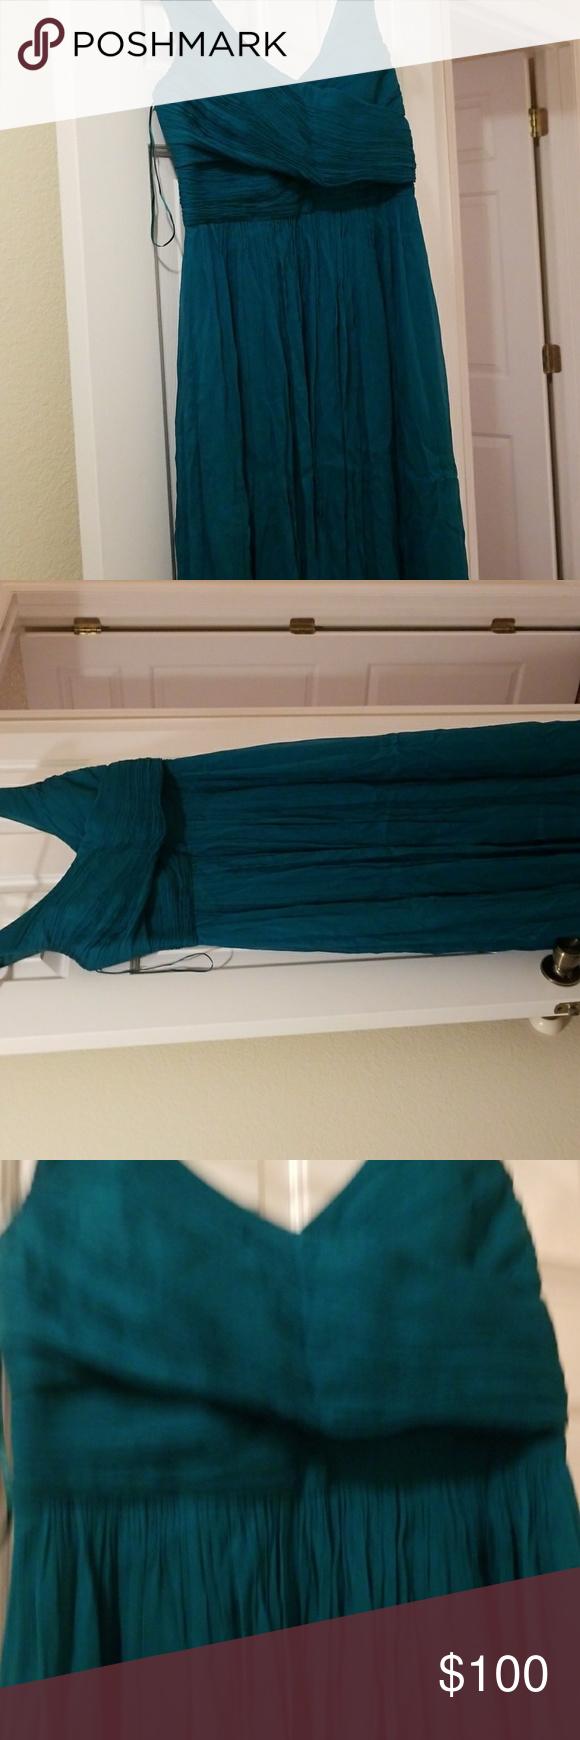 J crew bridesmaidprom dress teal worn once bridesmade dresses